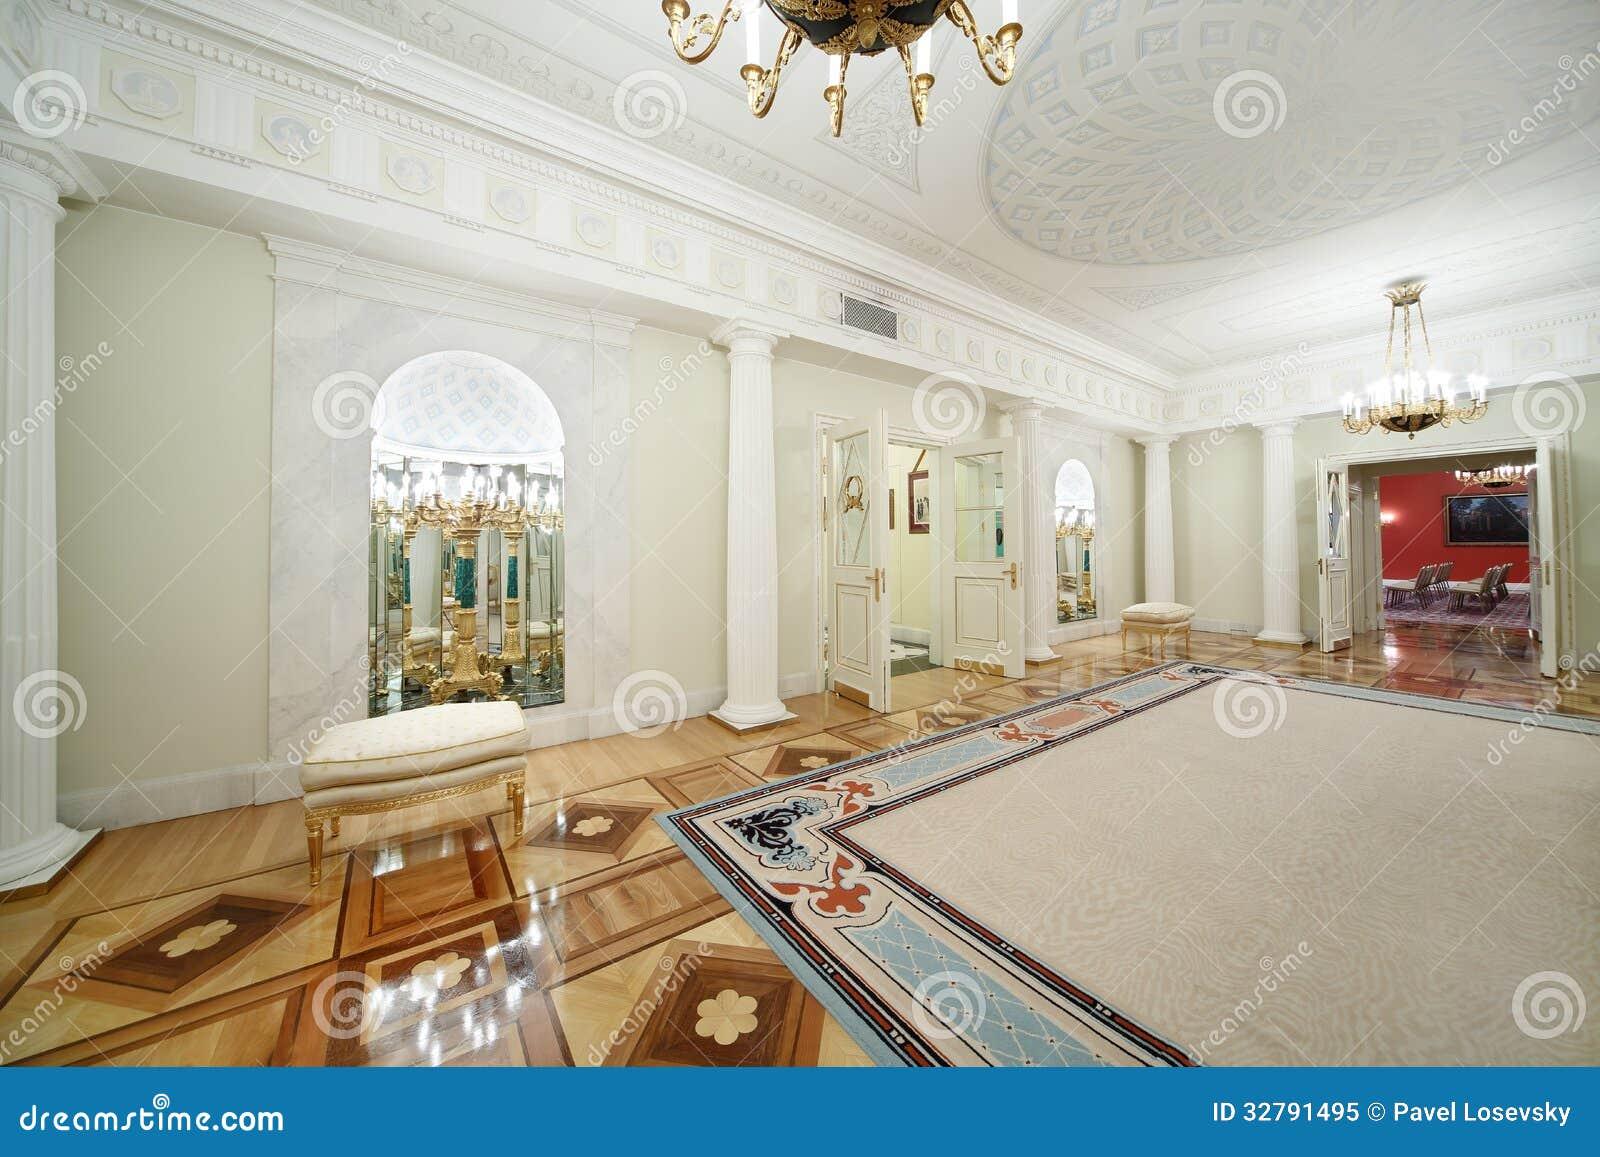 Hall In Grand Kremlin Palace Editorial Image Image 32791495